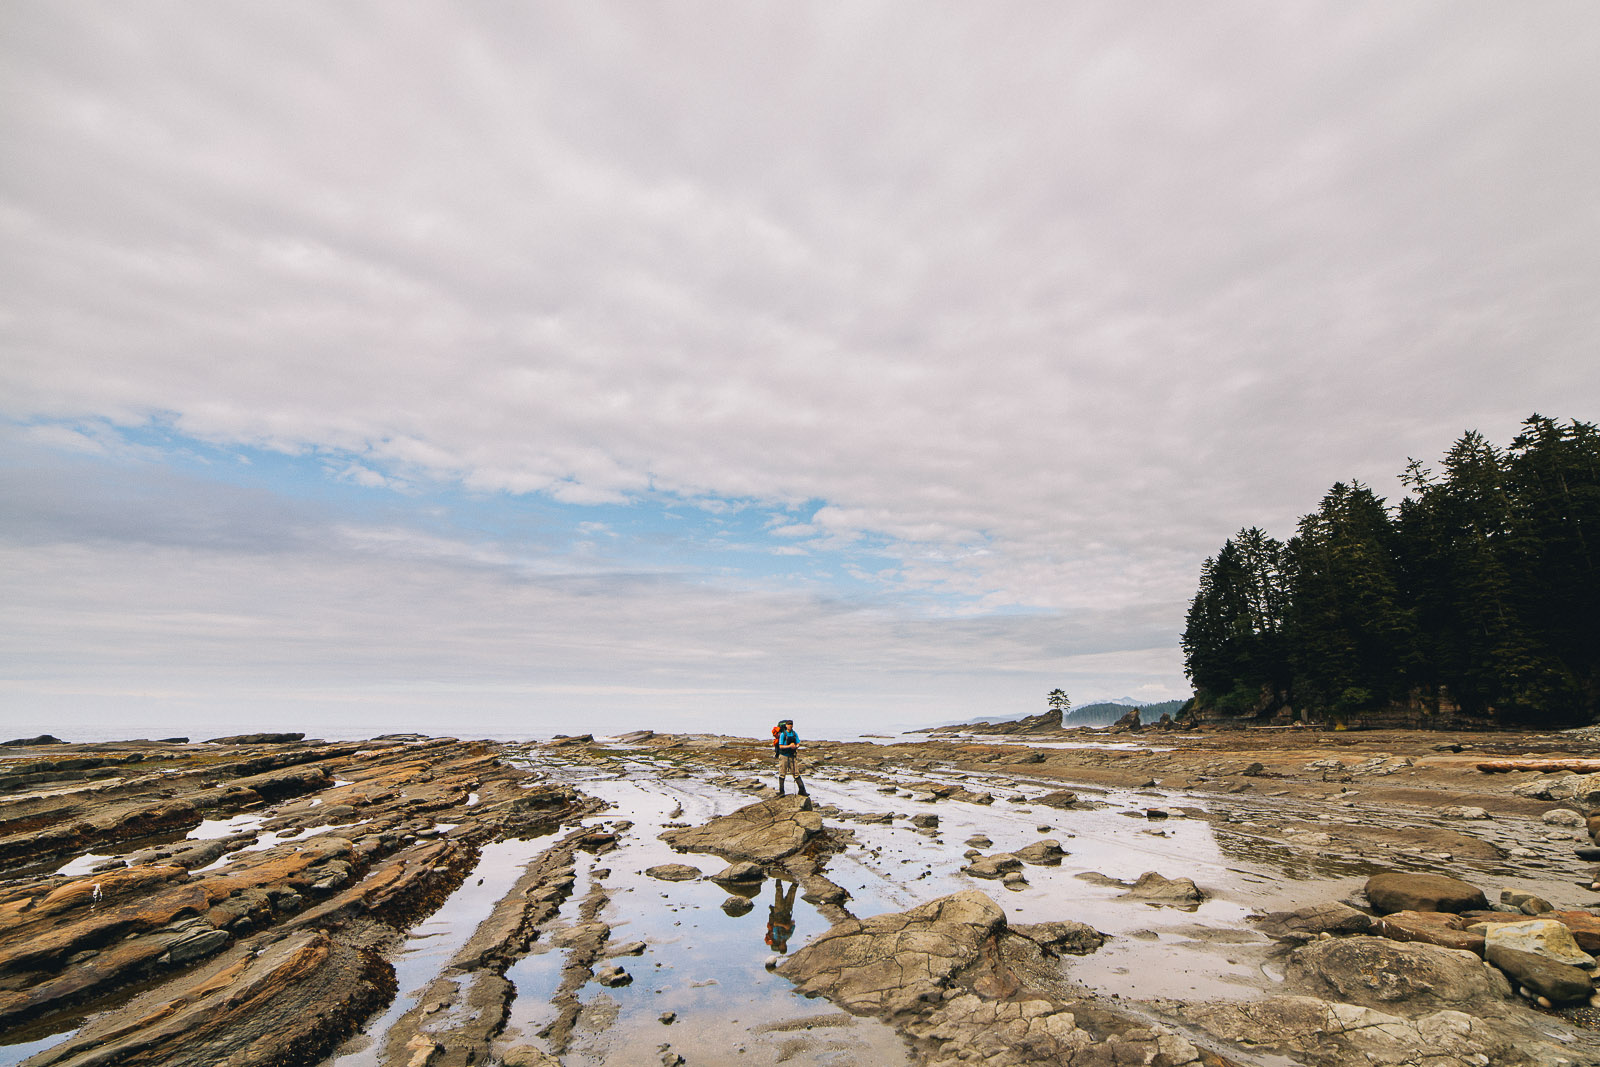 west coast trail rocks shoreline